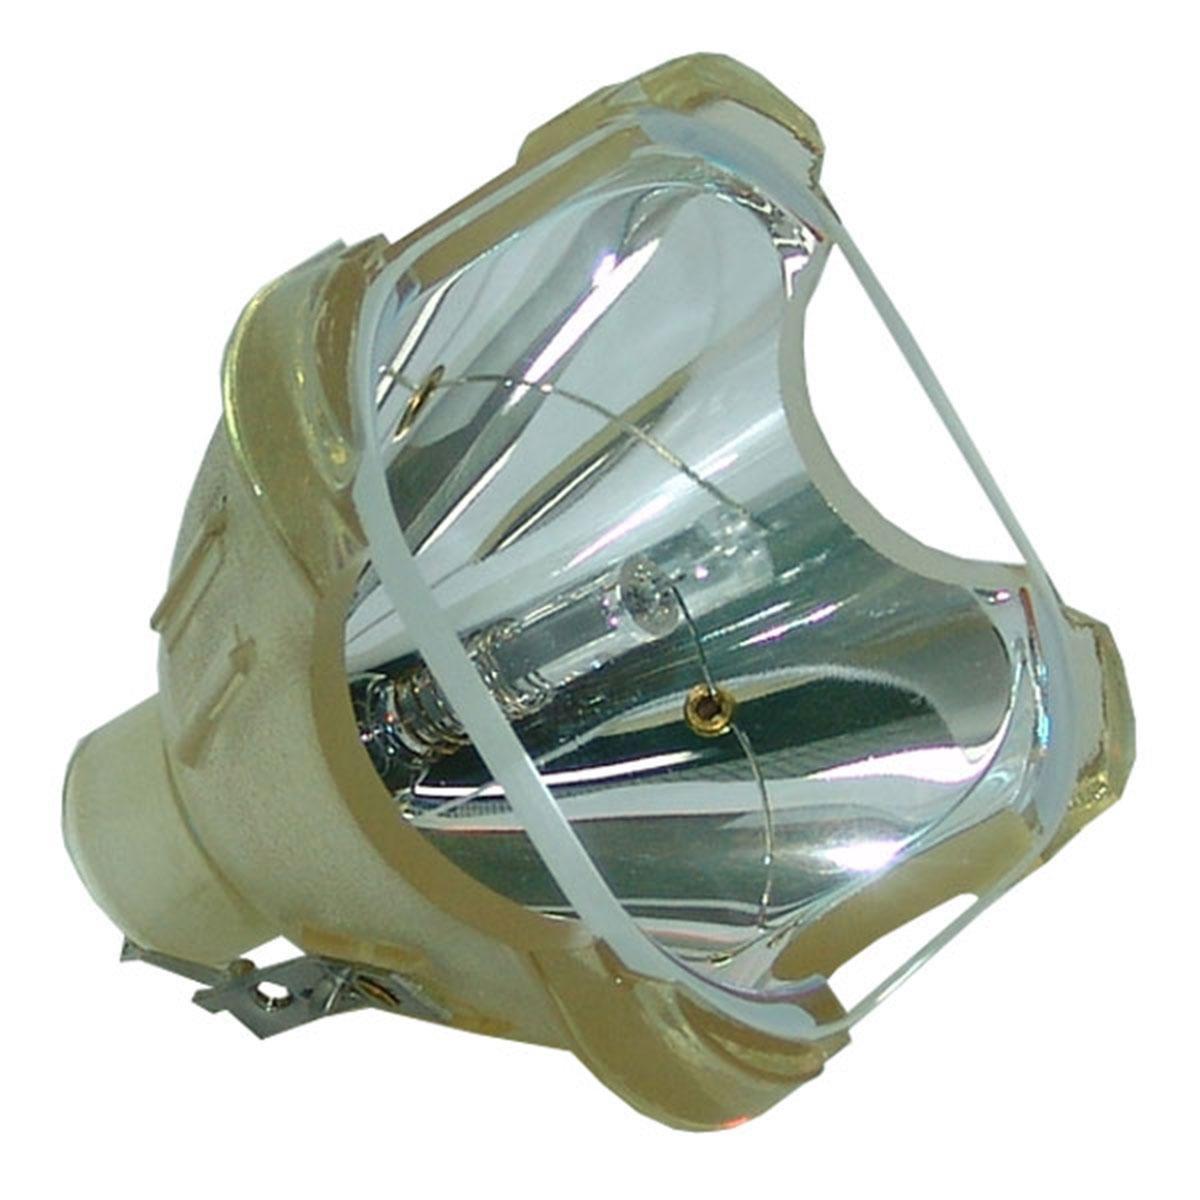 VPL-HW15 Philips UHP Projektorlampe LMP-H201 f/ür SONY VPL-HW10 VPL-GH10 VPL-VW85 VPL-VW80 VPL-HW20 VPL-VW90ES VPL-VW70